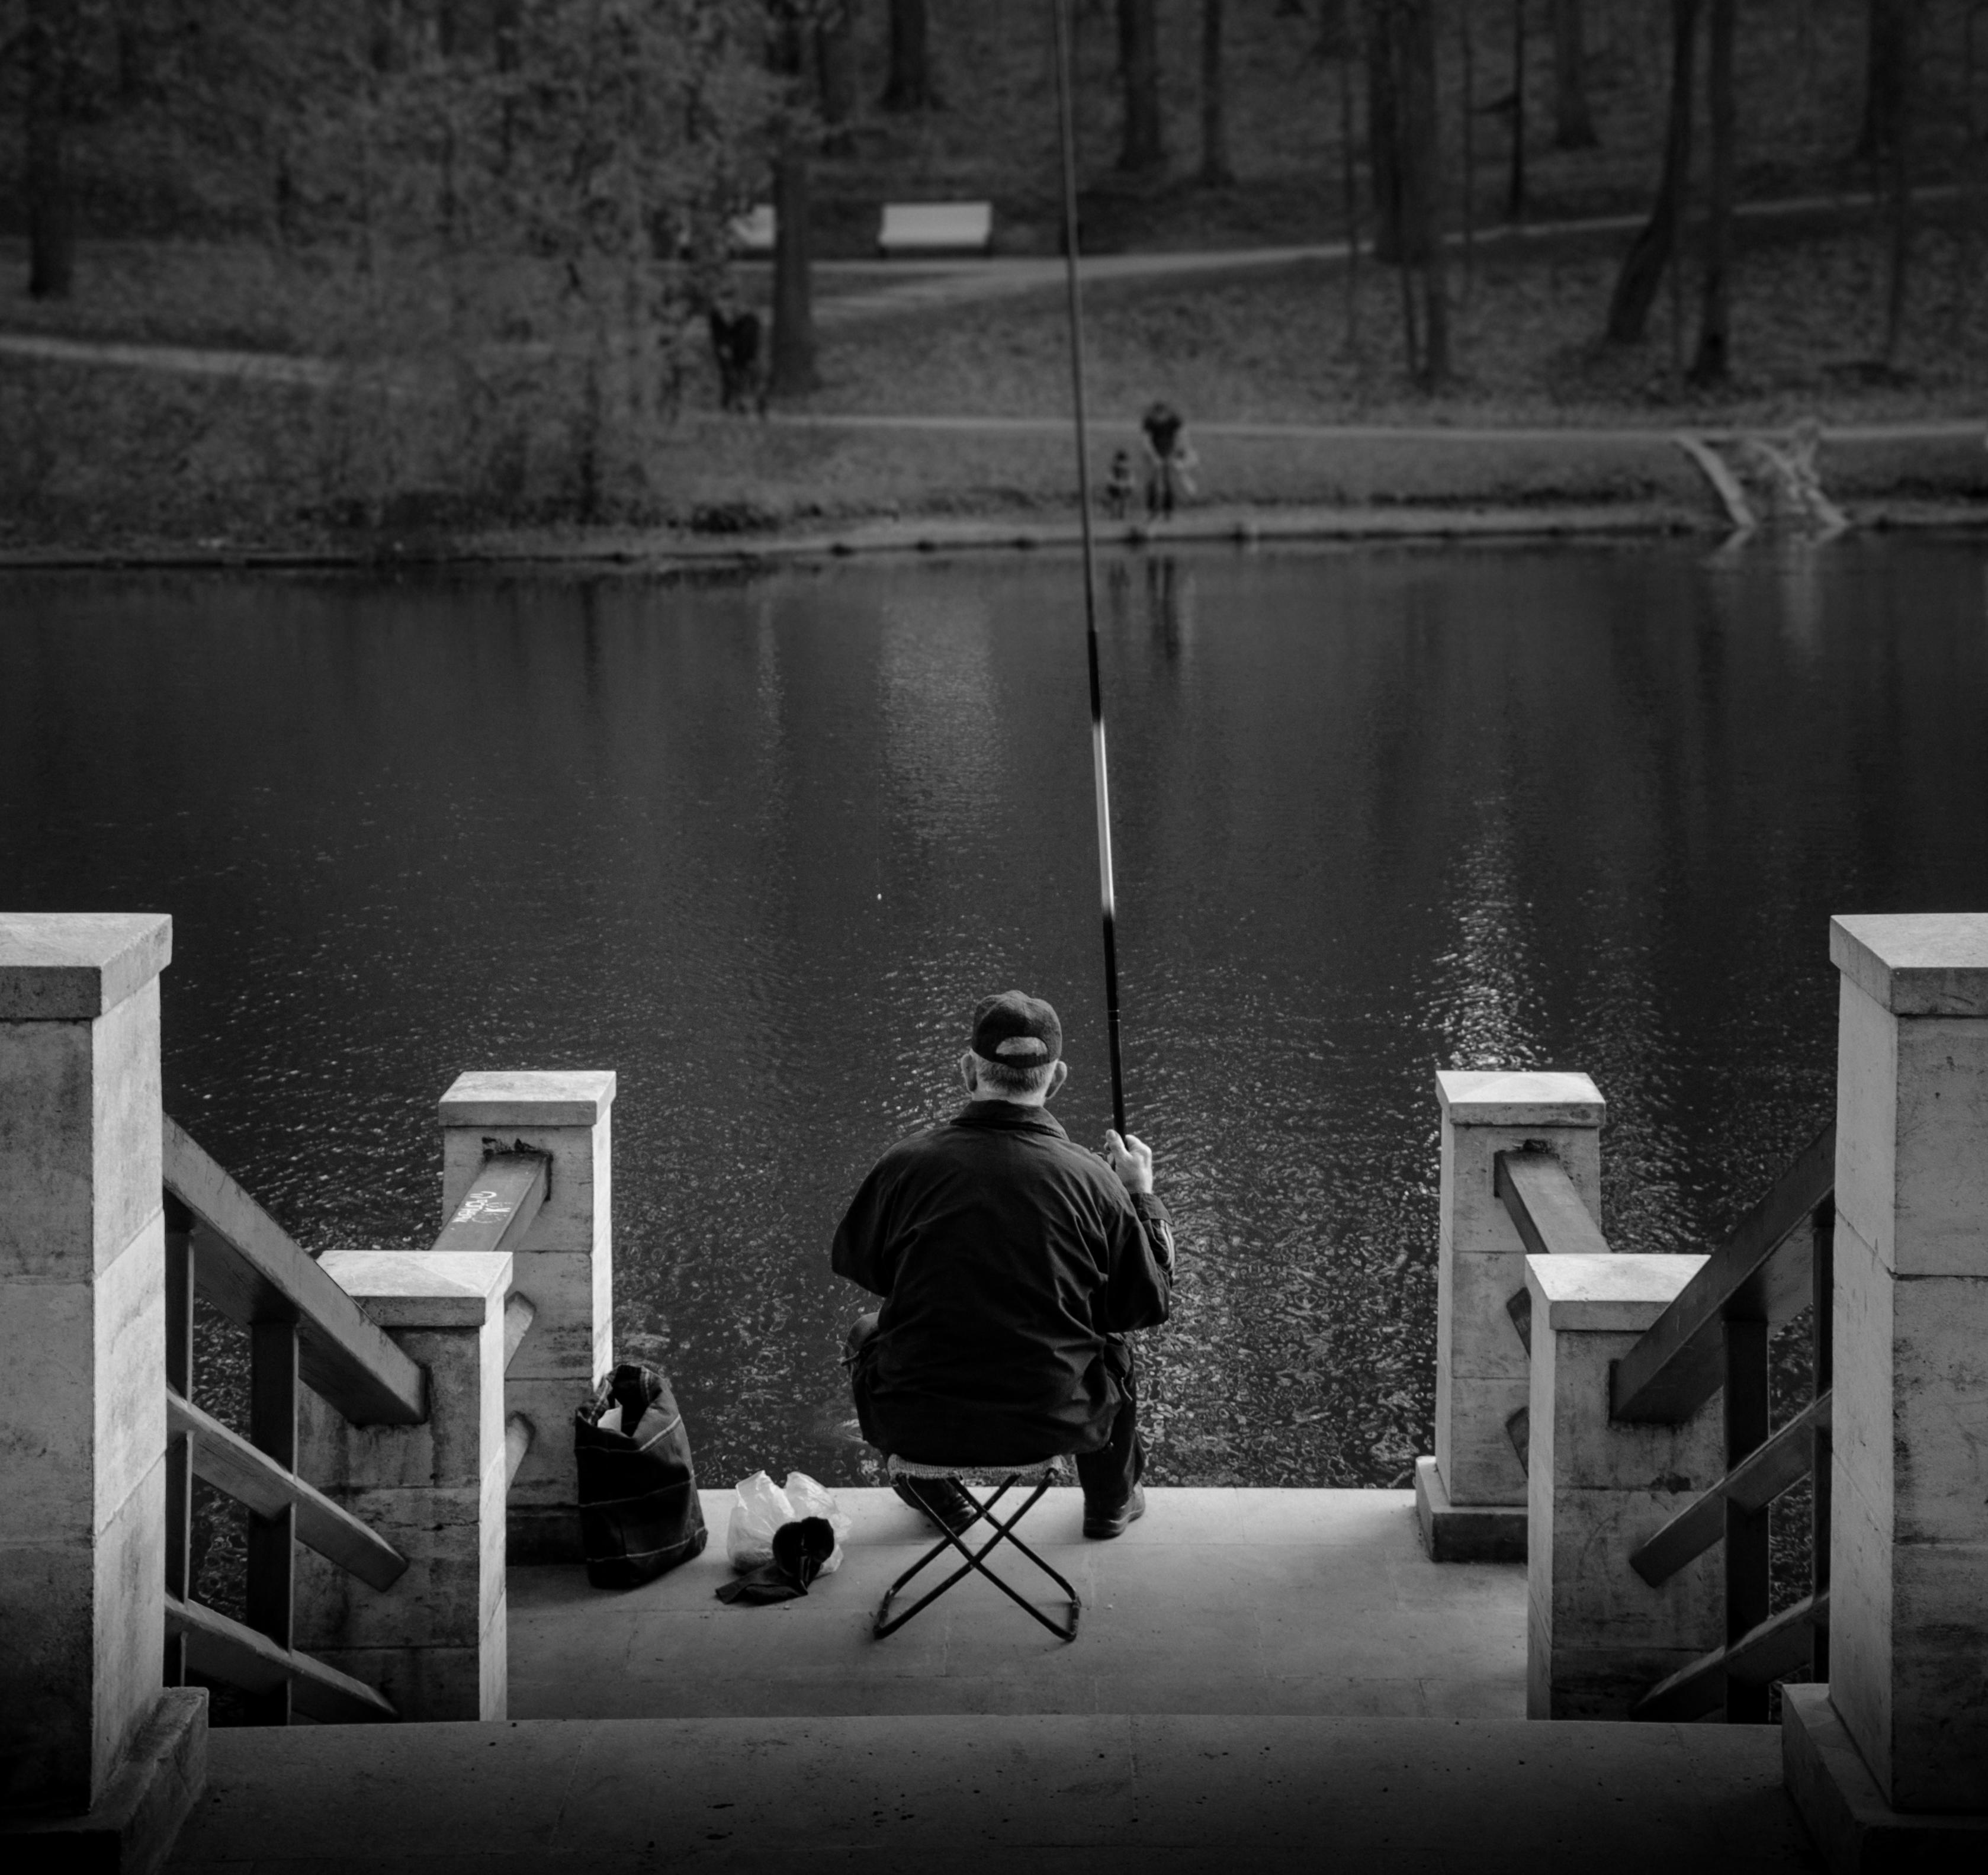 Fisherman (рыбак)